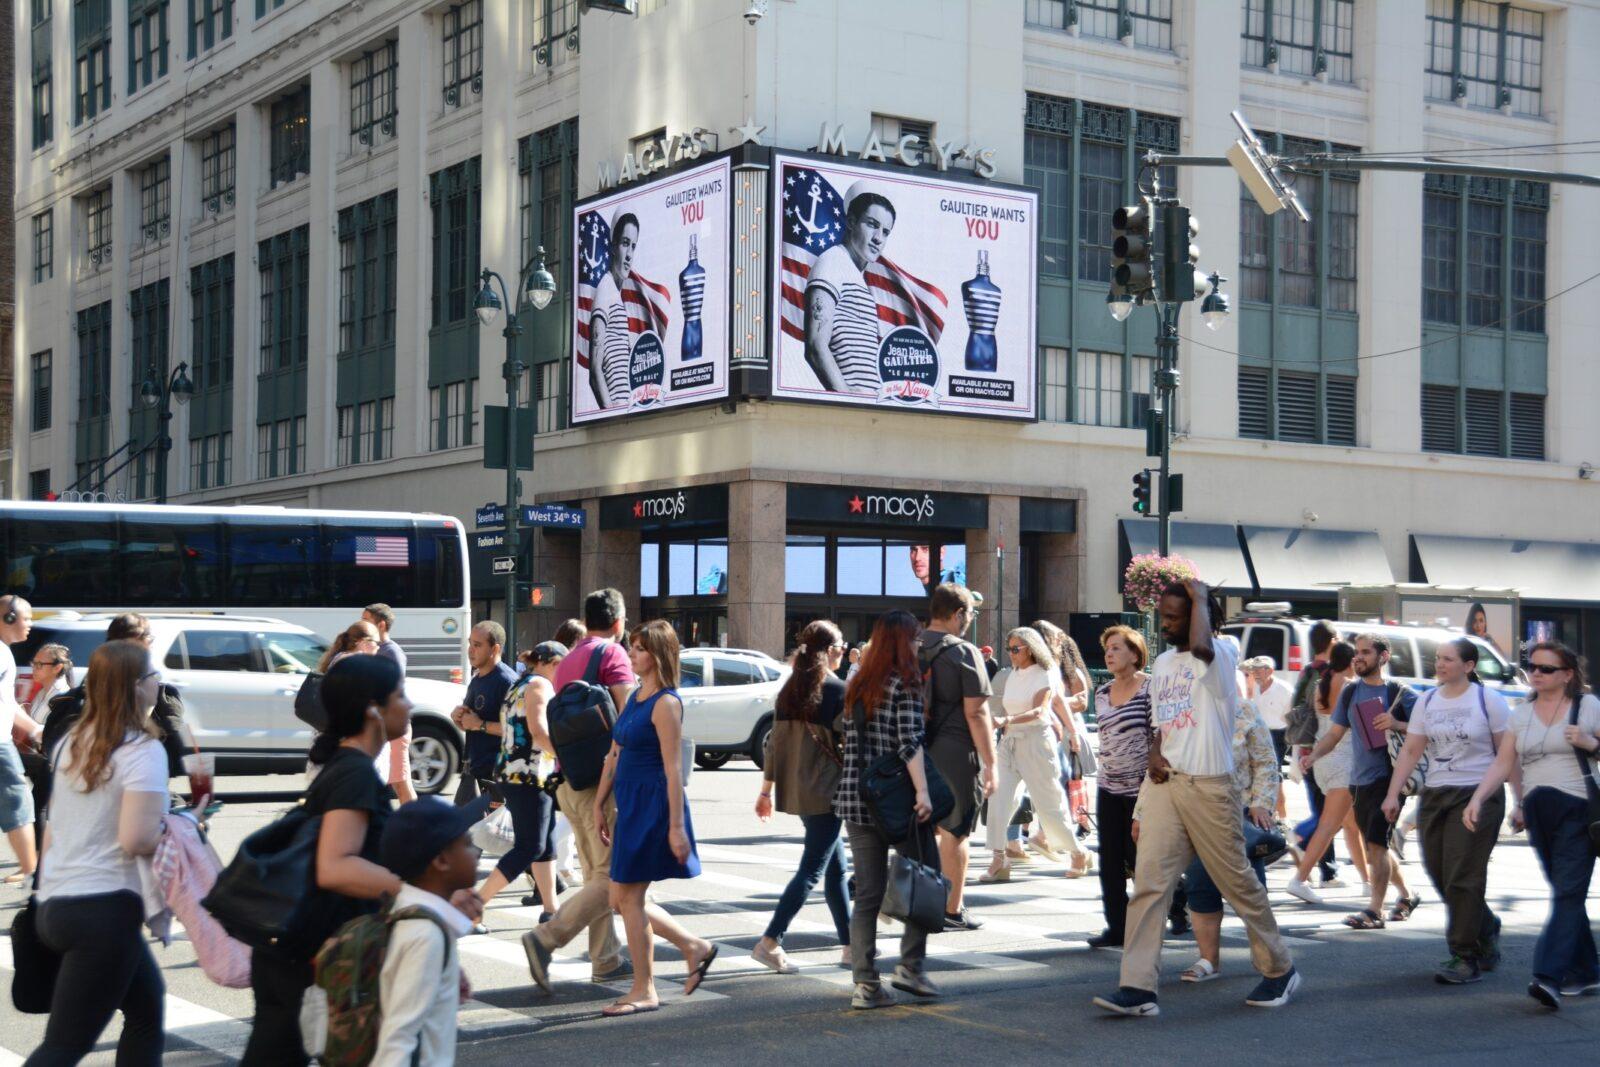 Prada Macy's Digital Billboard Advertising Campaign